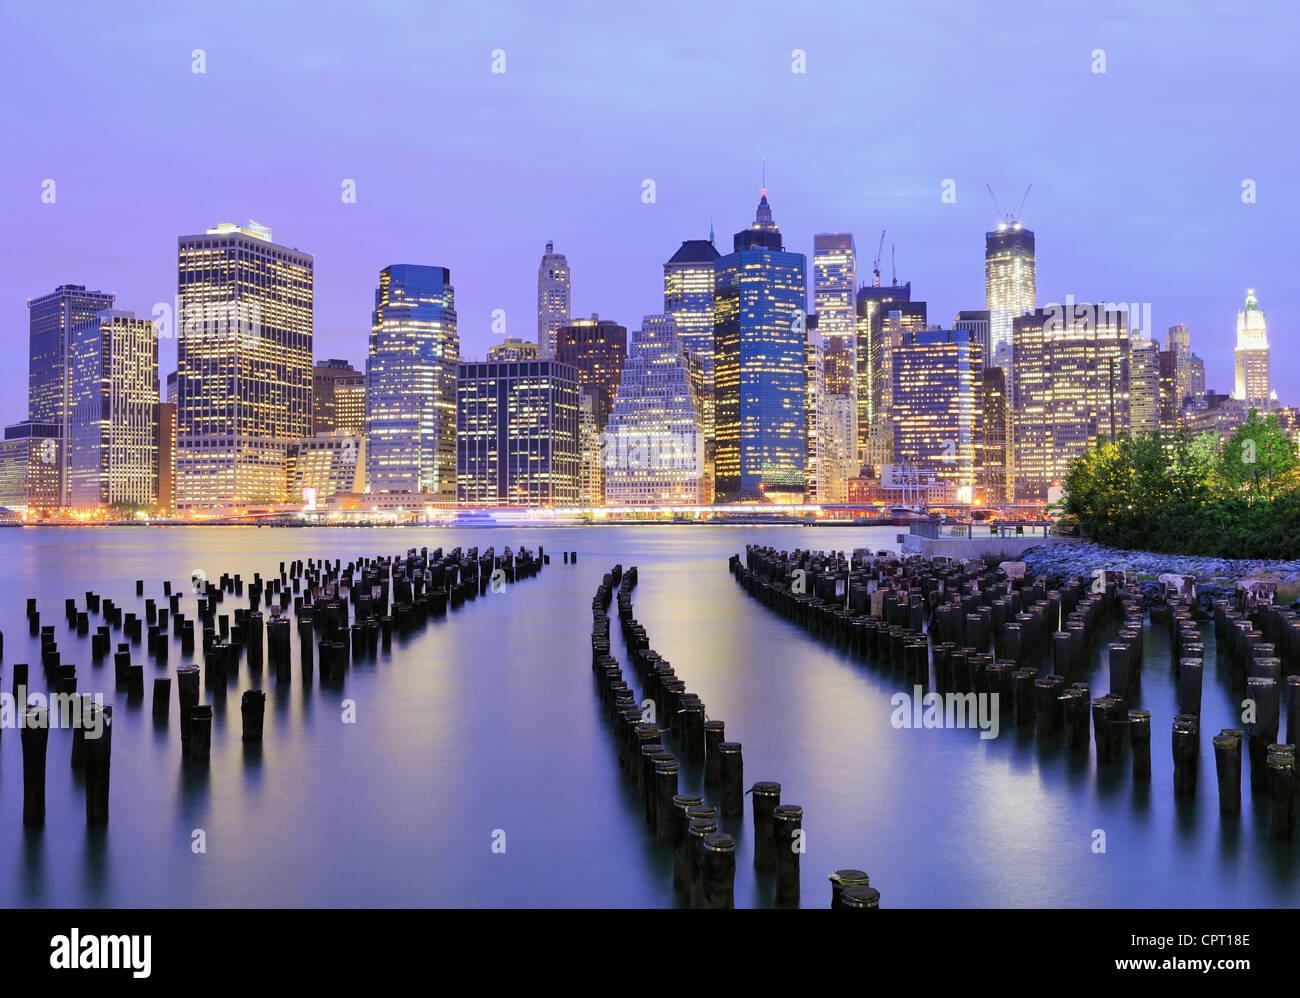 Lower Manhattan at night in New York City - Stock Image